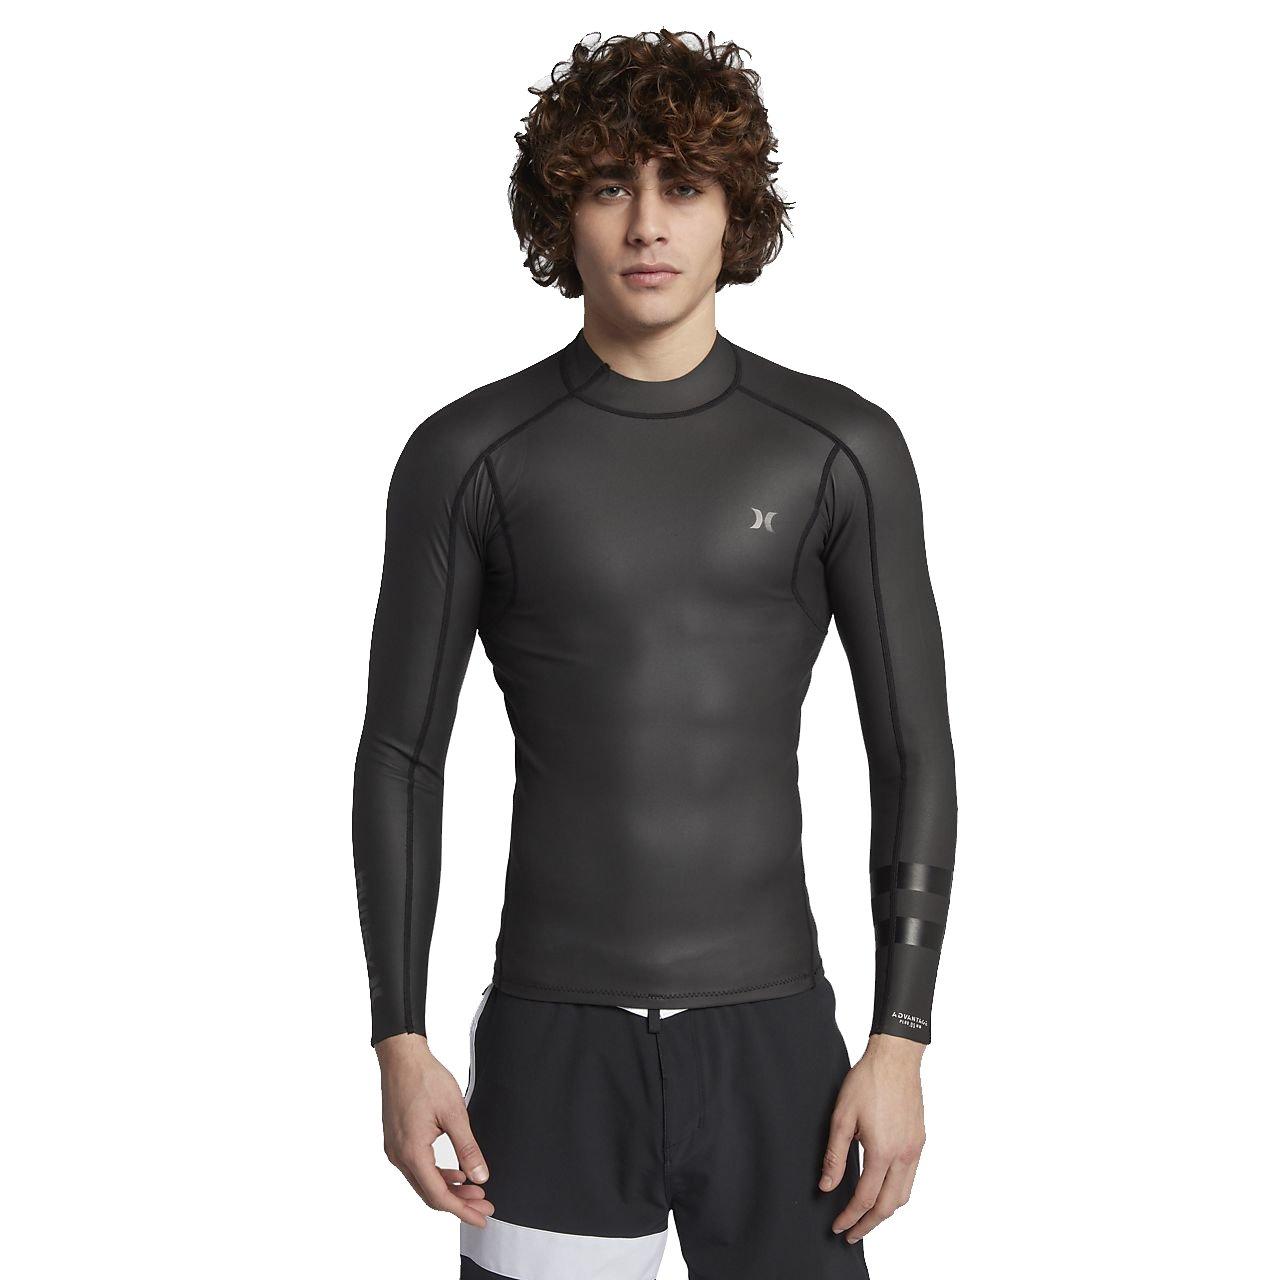 Hurley 890930 Men's Advantage Plus Windskin Jacket, Black - X-Large by Hurley